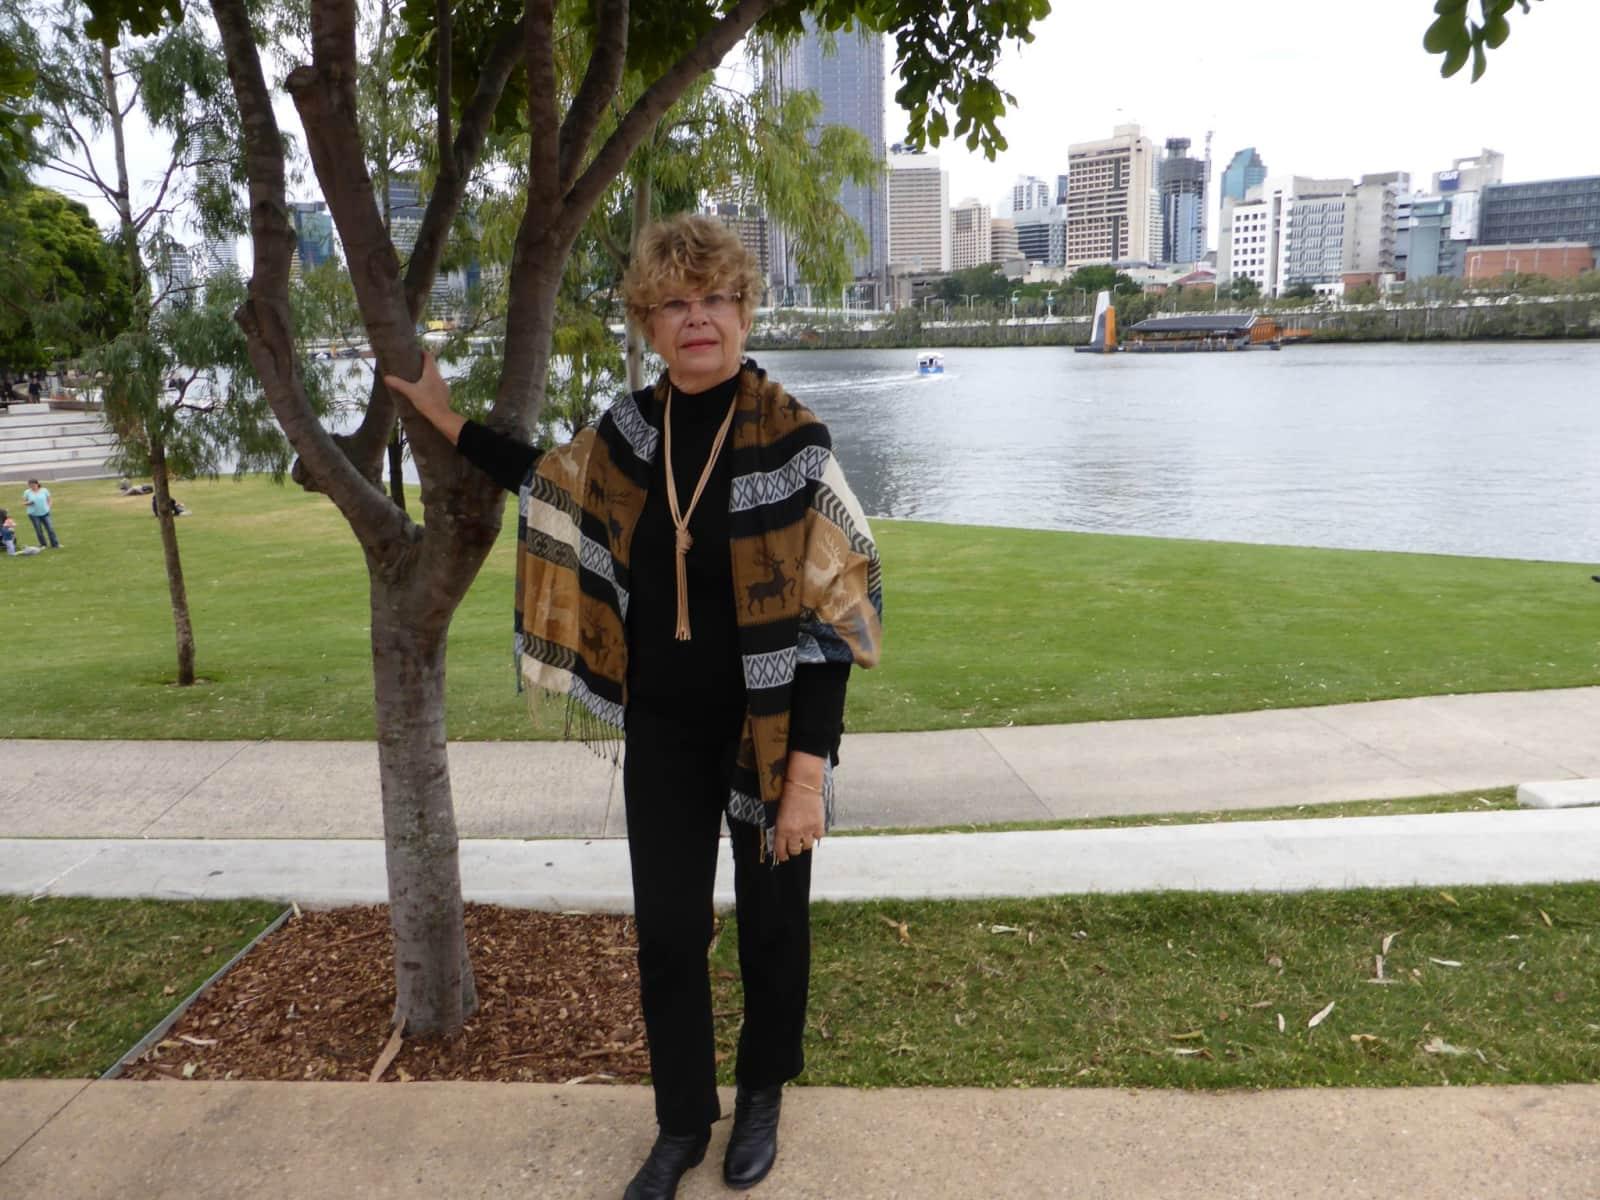 Raye from Brisbane, Queensland, Australia